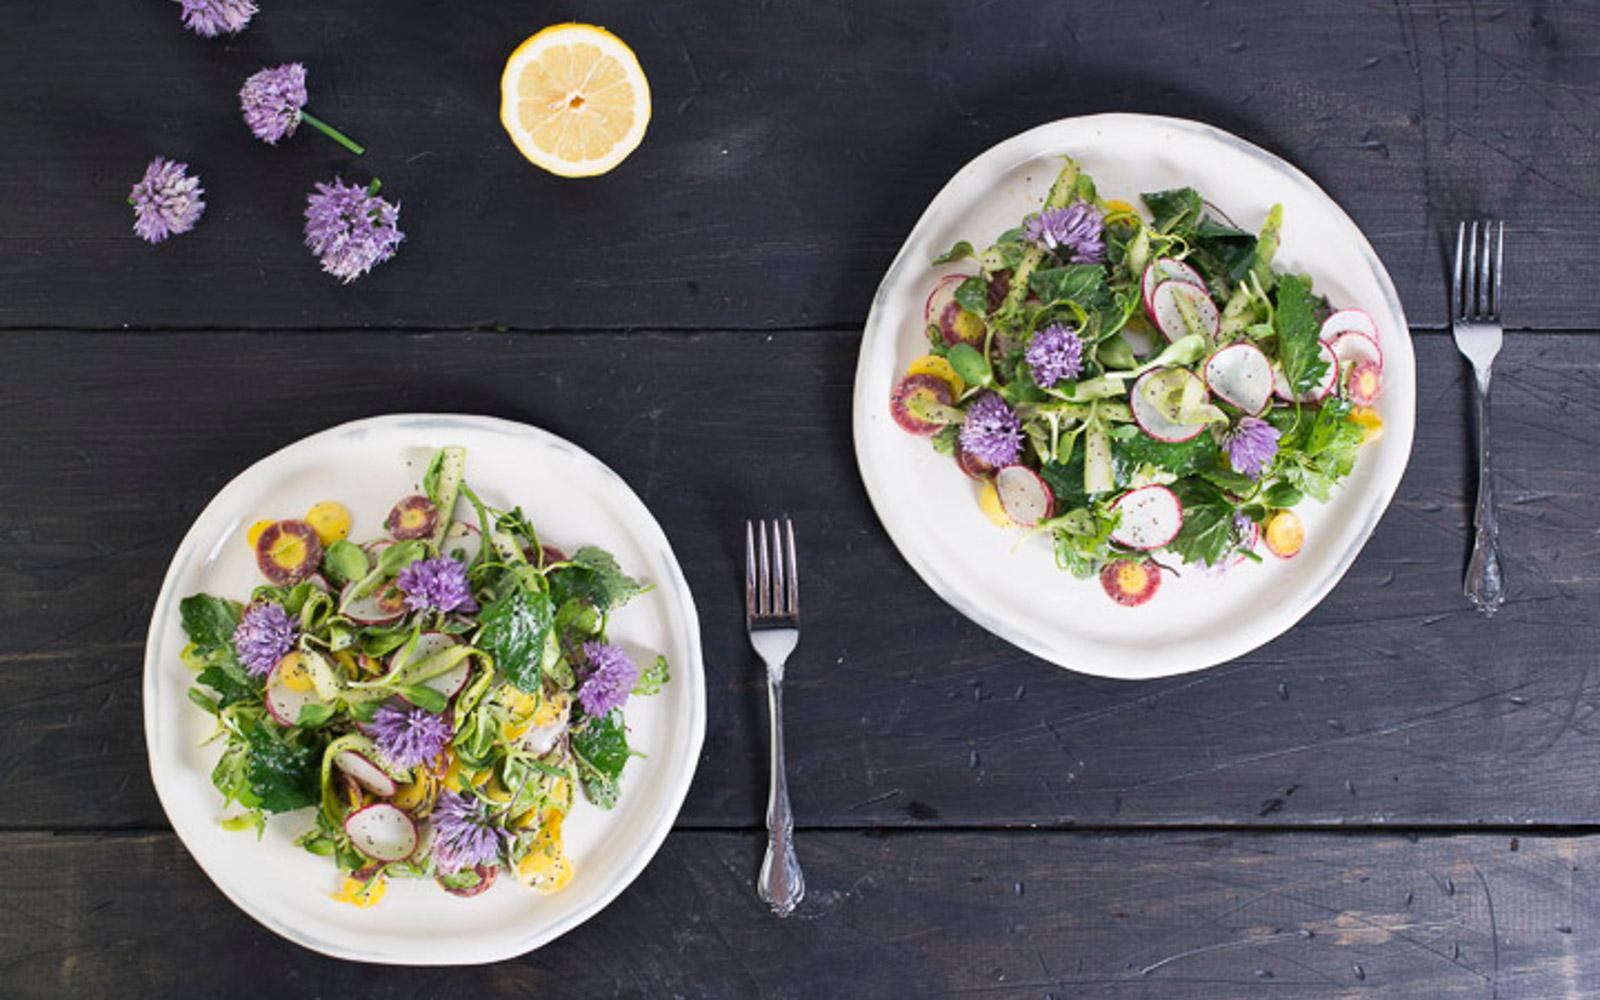 Wild spinach and asparagus salad 2